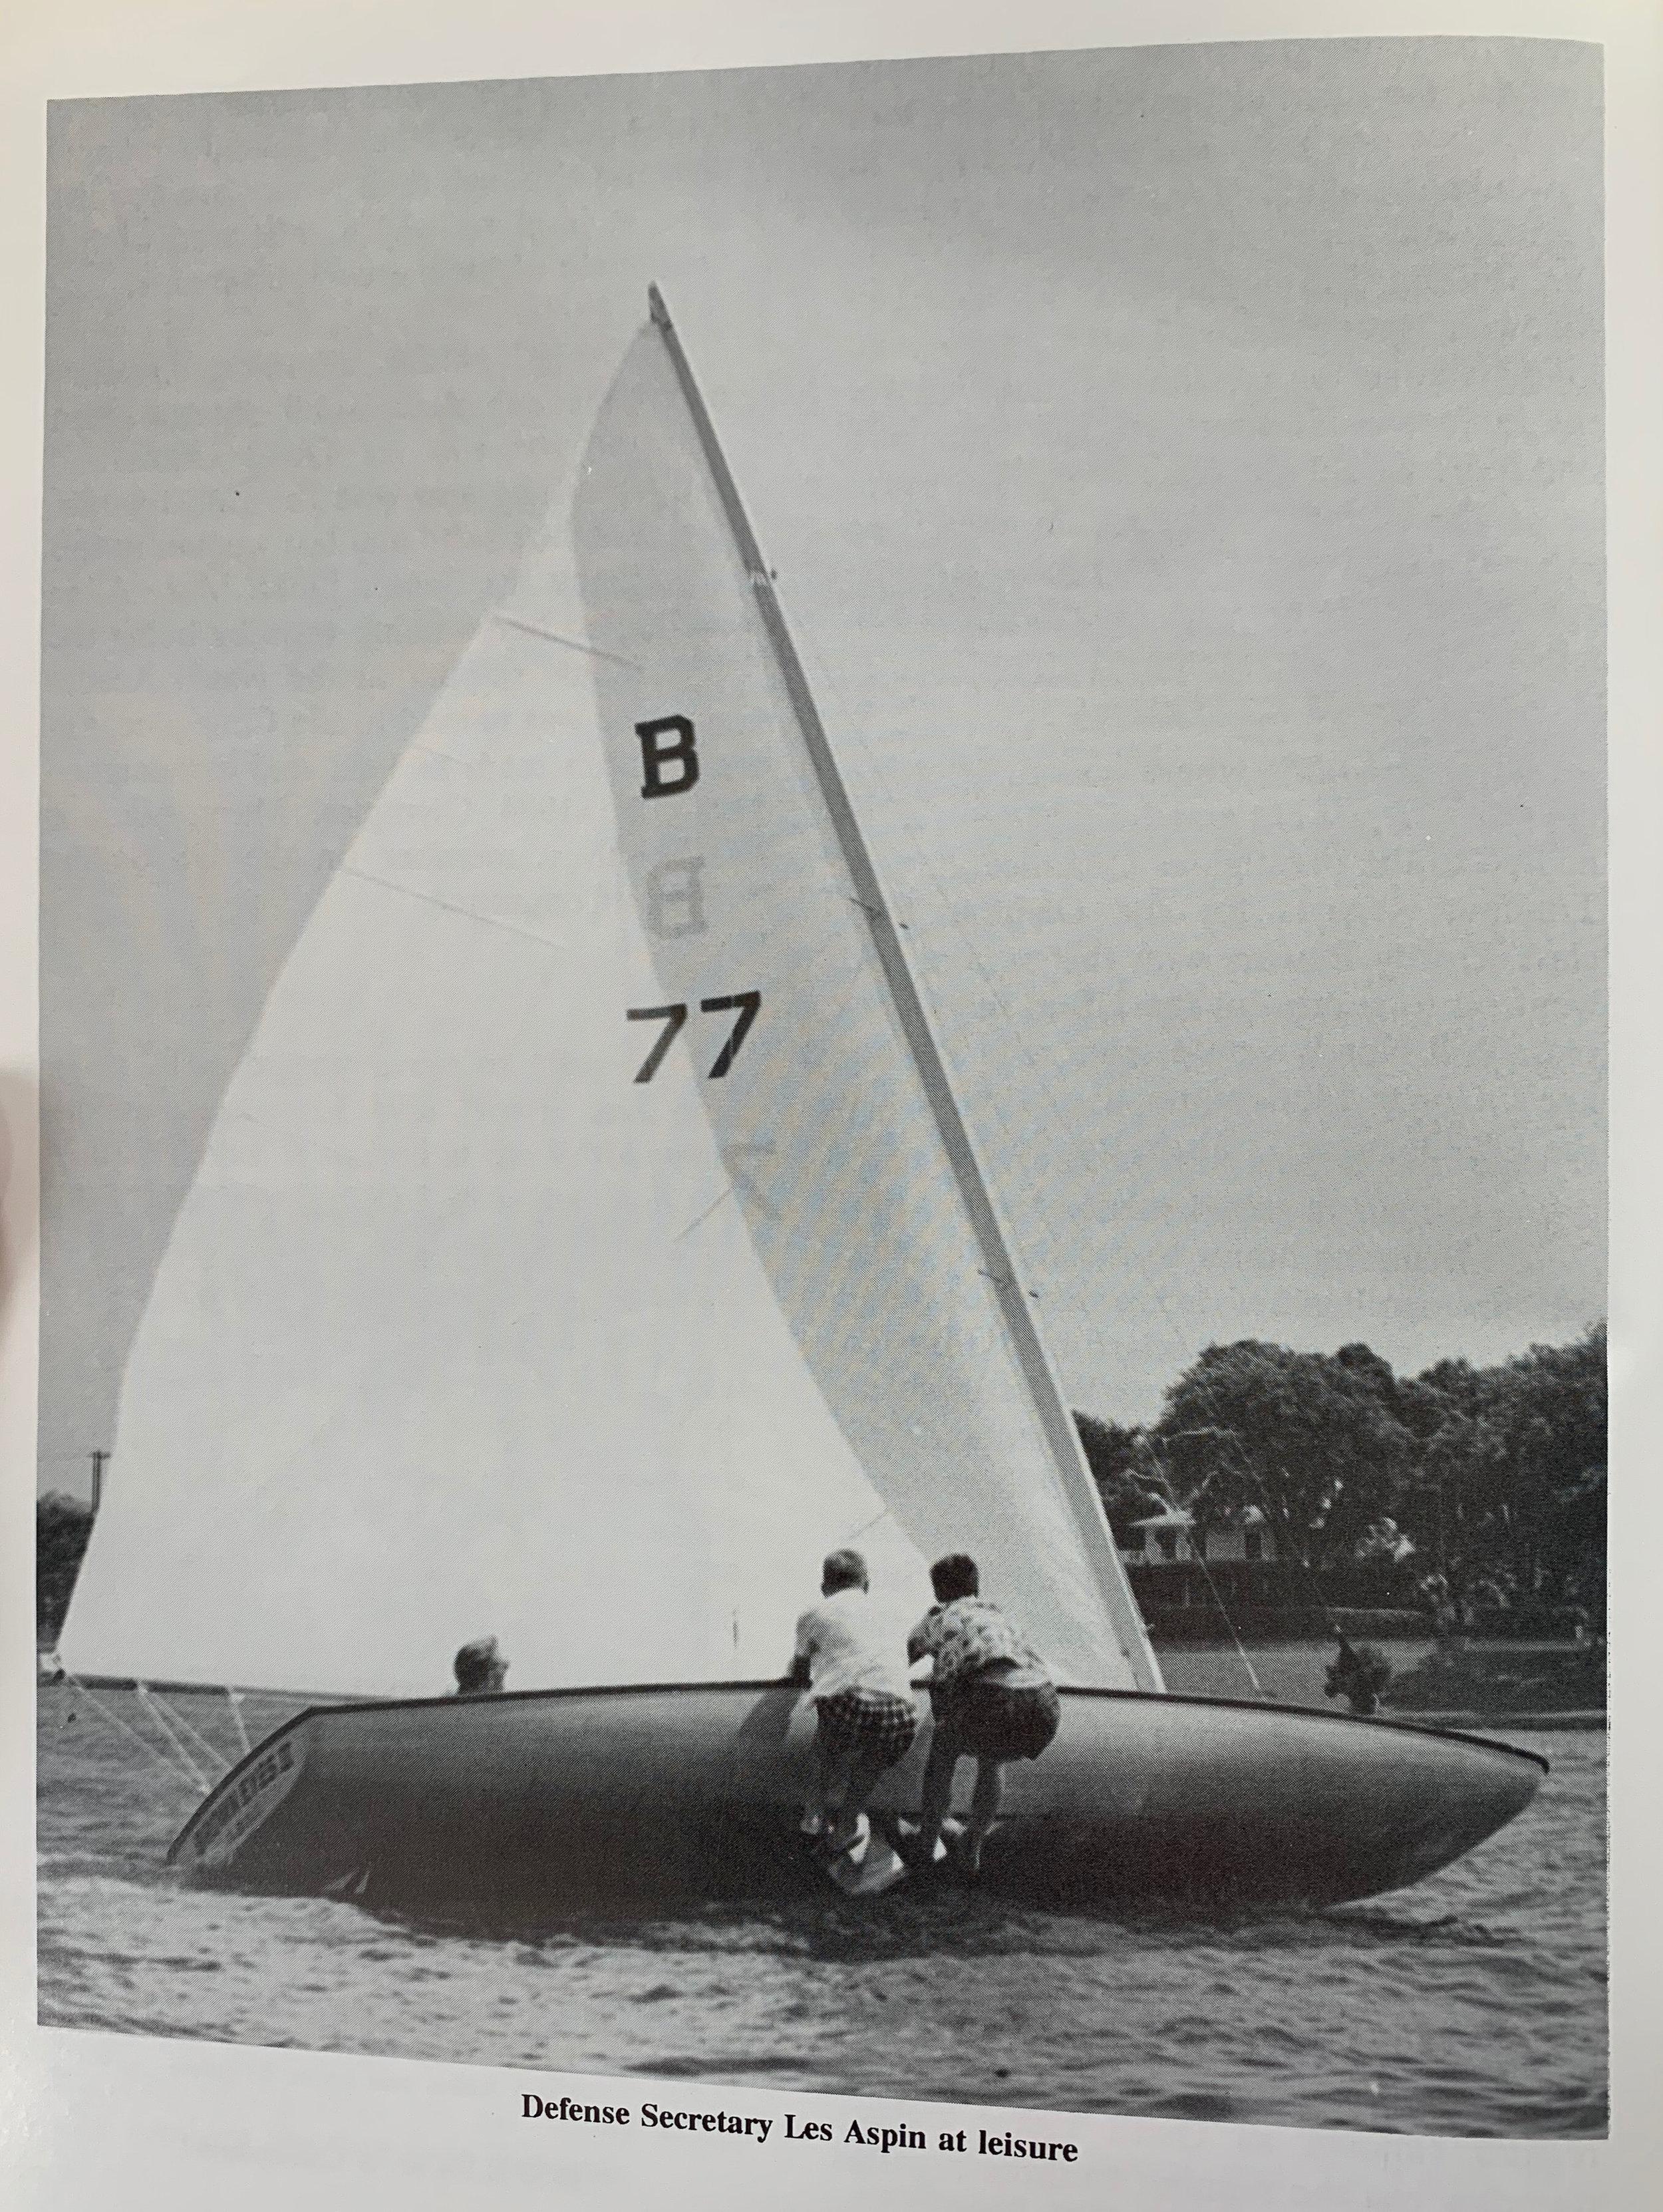 Lake_Beulah_History_LBYC-013.jpg